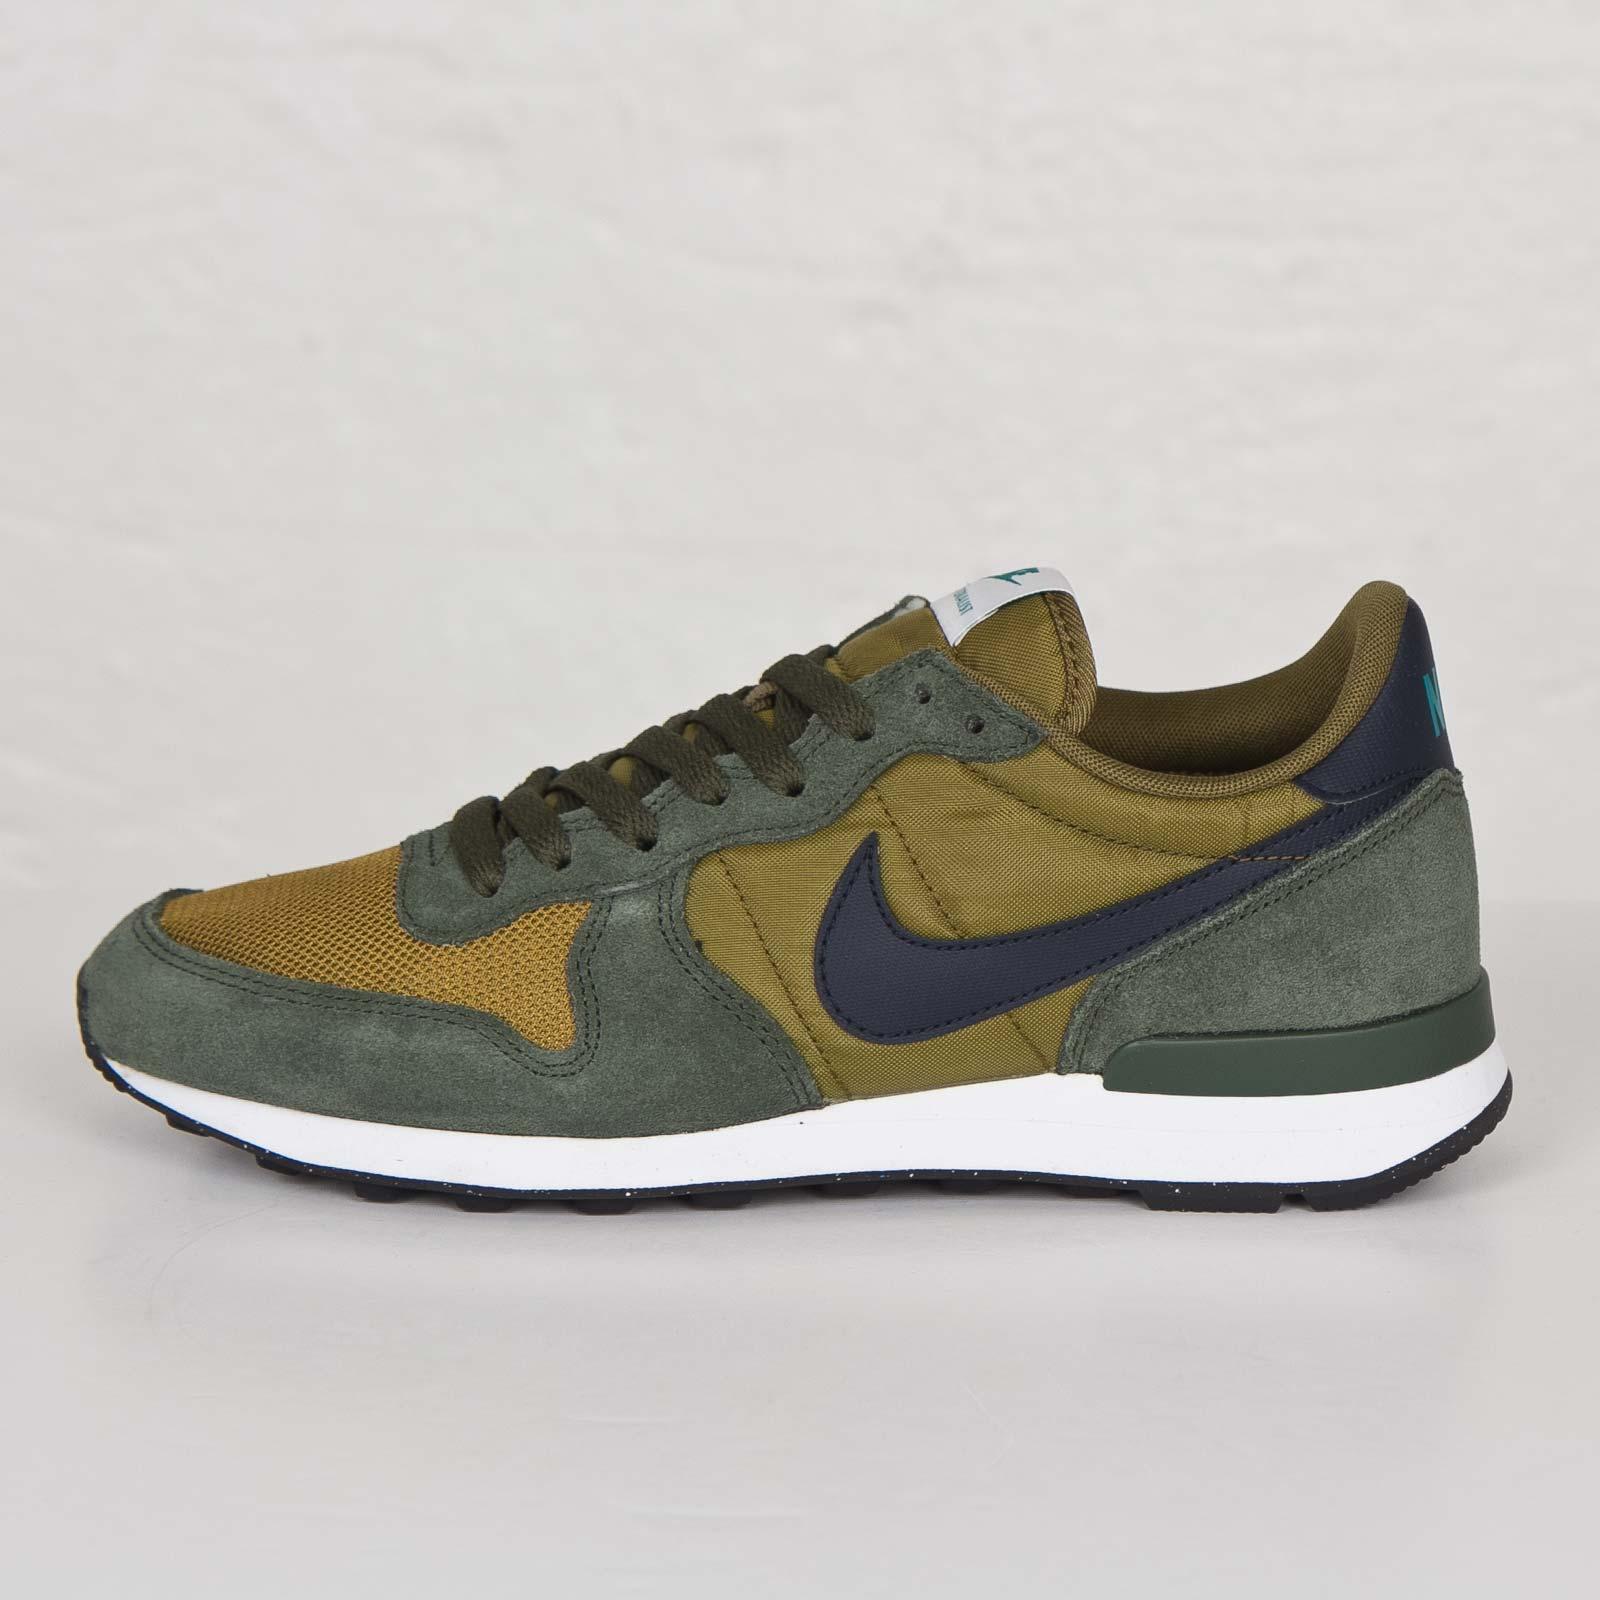 Nike Internationalist (Military Green Dark Obsidian